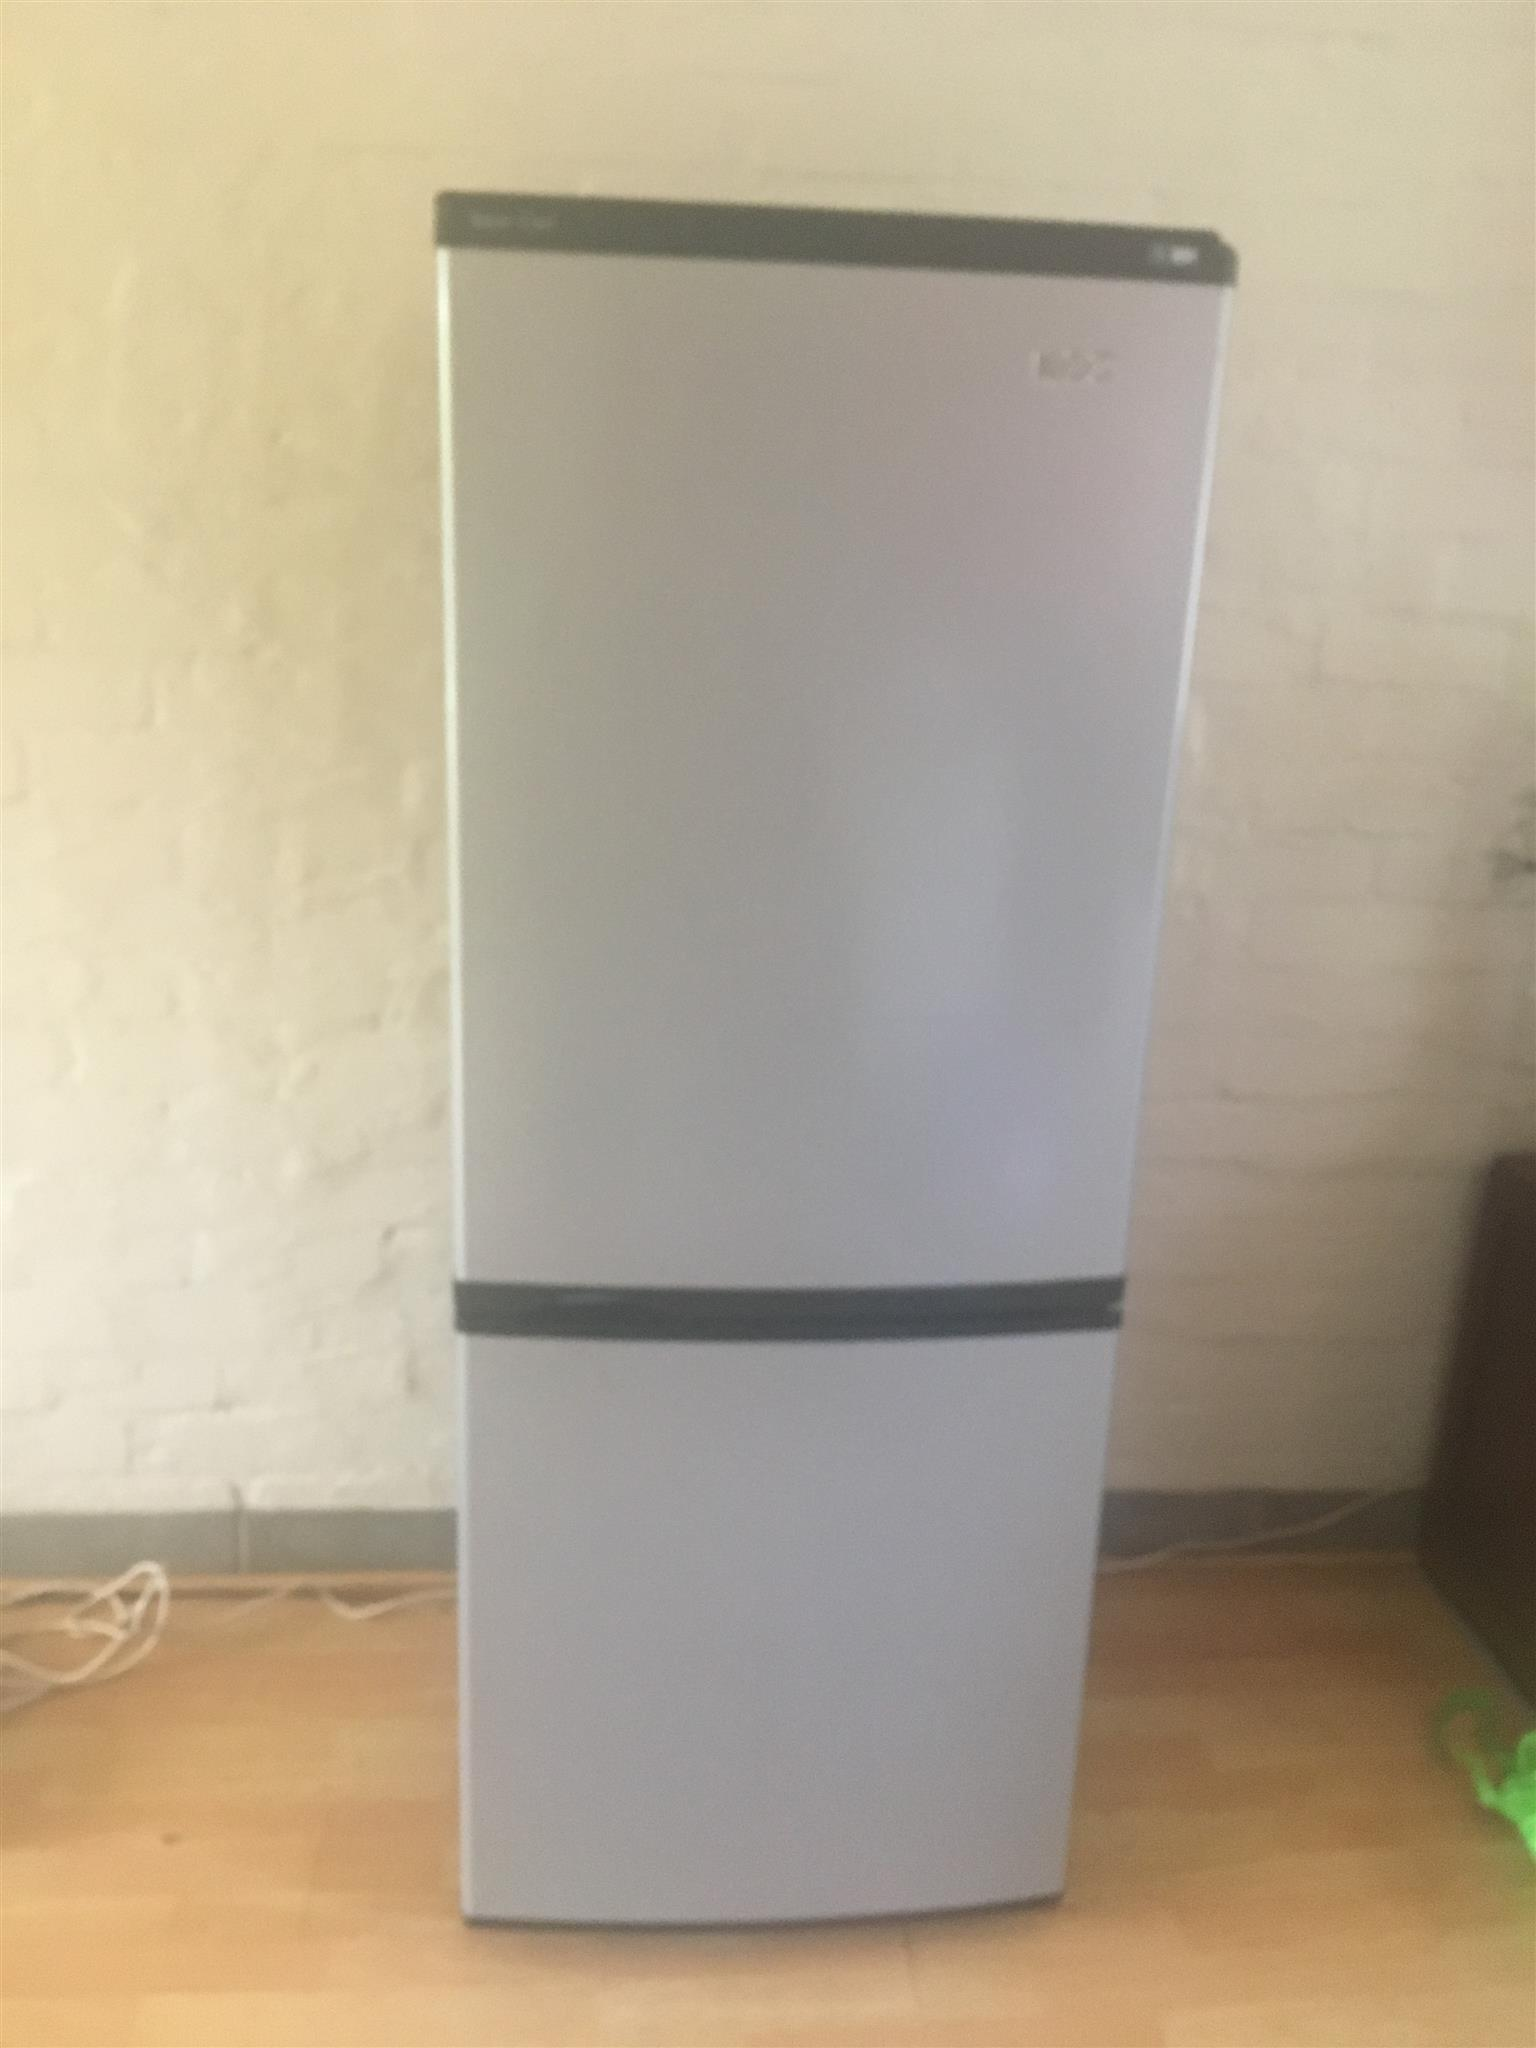 Fridge/Freezer for sale - metallic